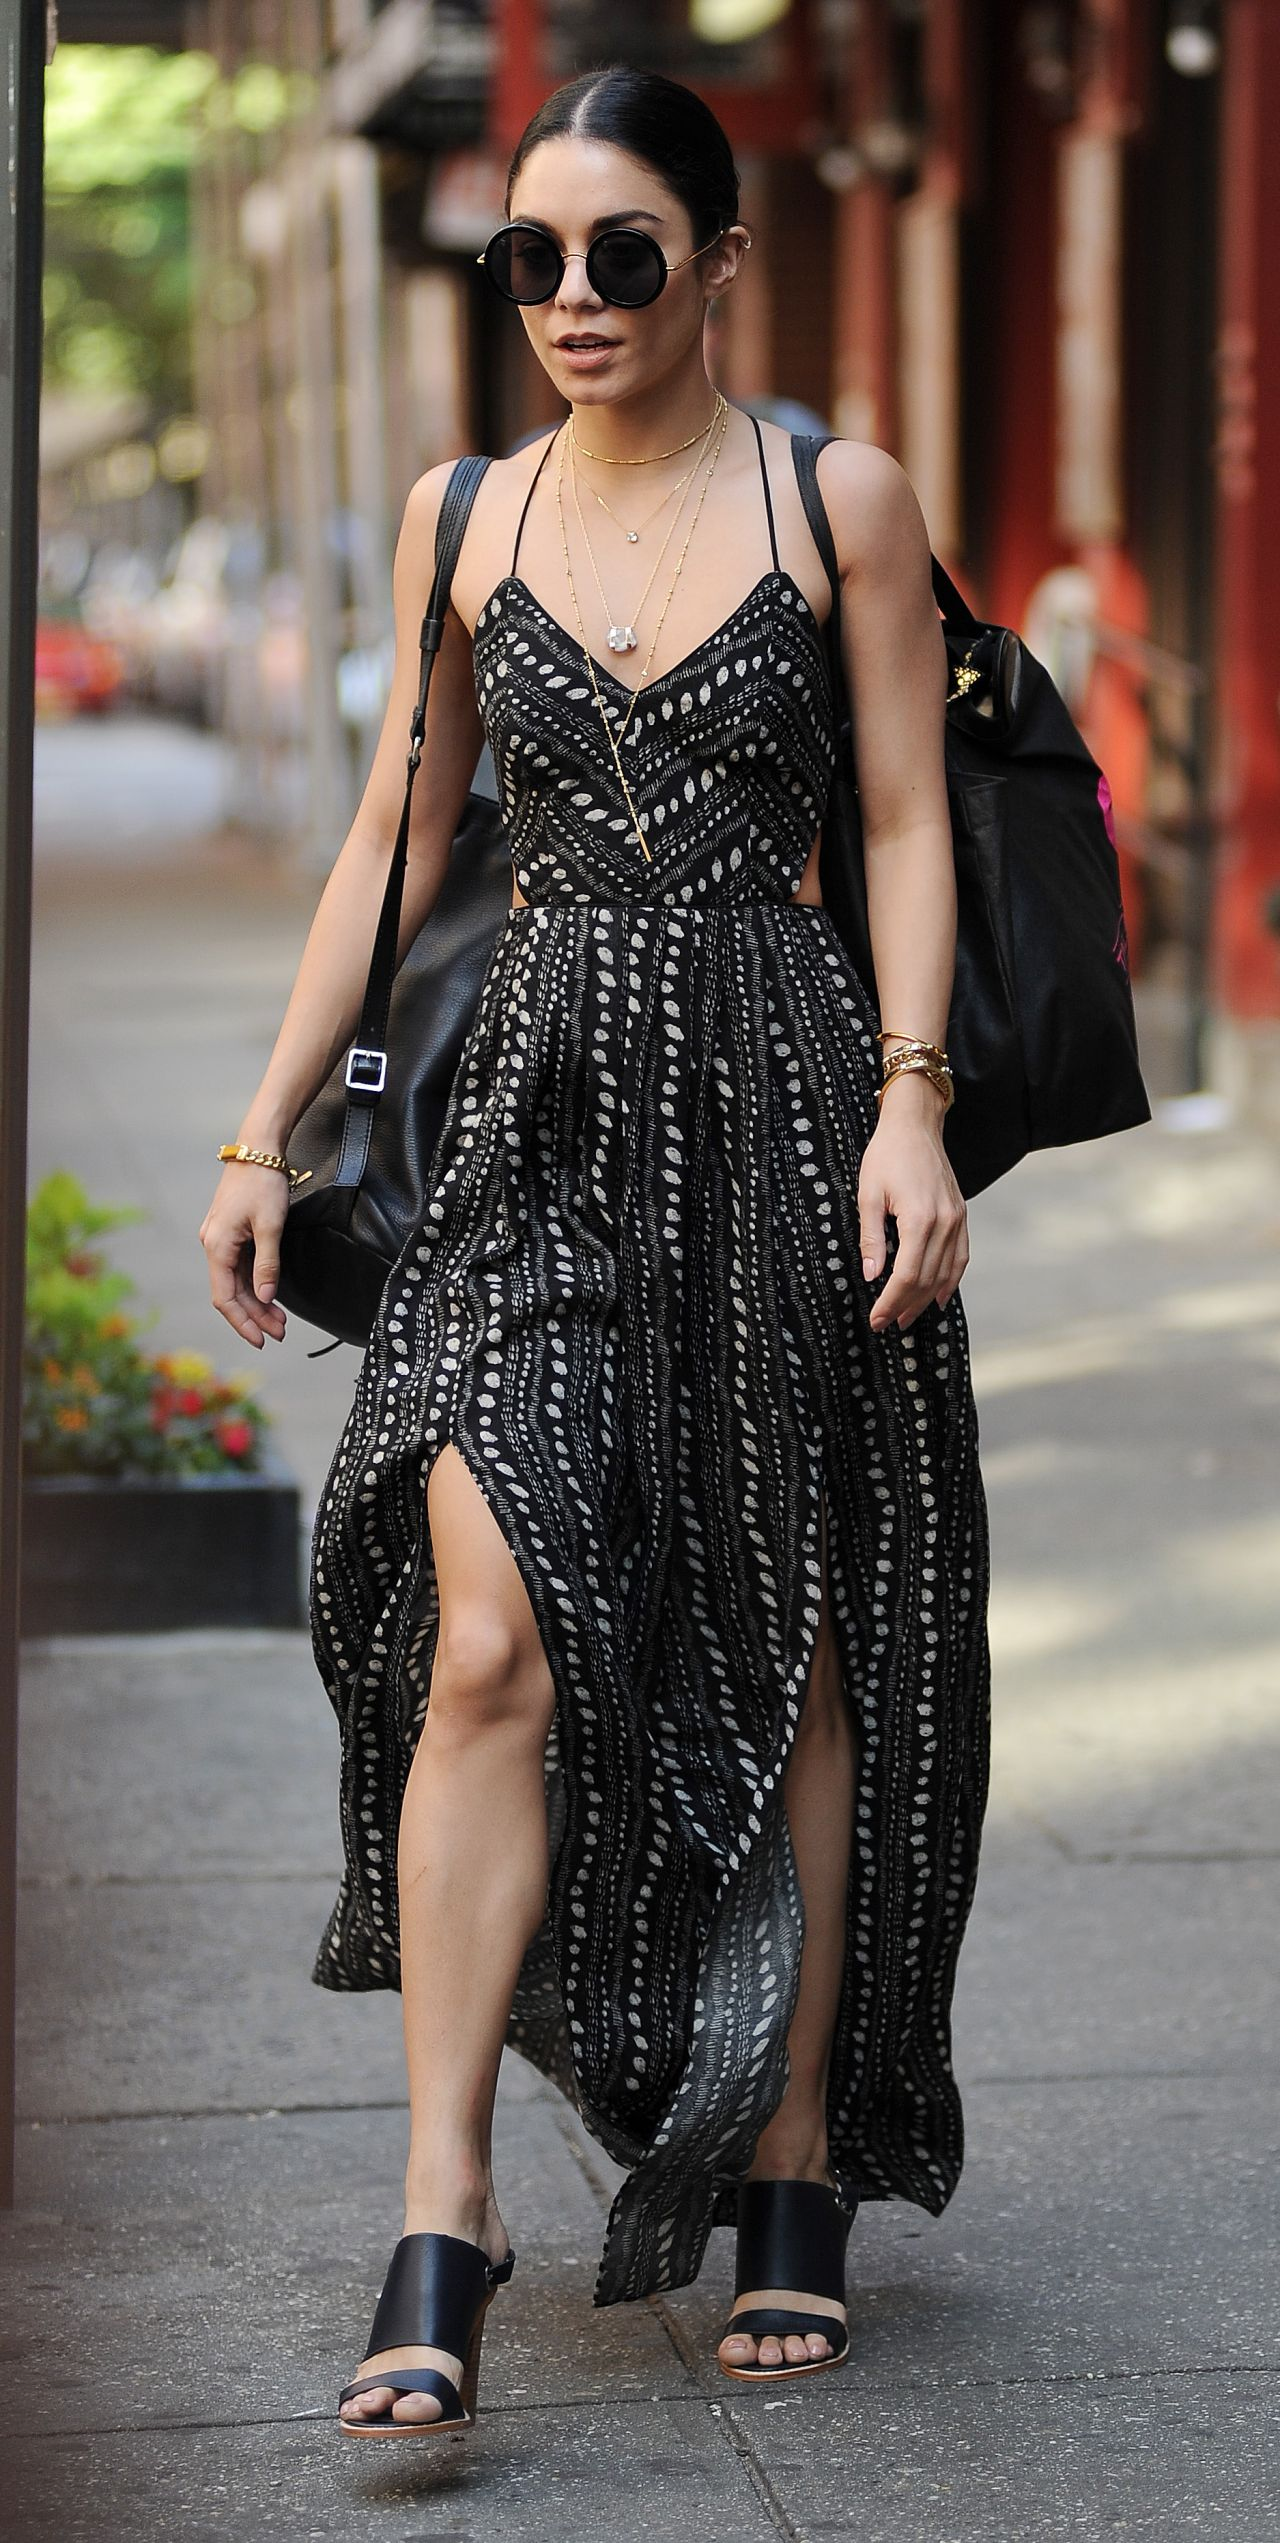 Vanessa Hudgens Style Leaving Her Apartment In Soho